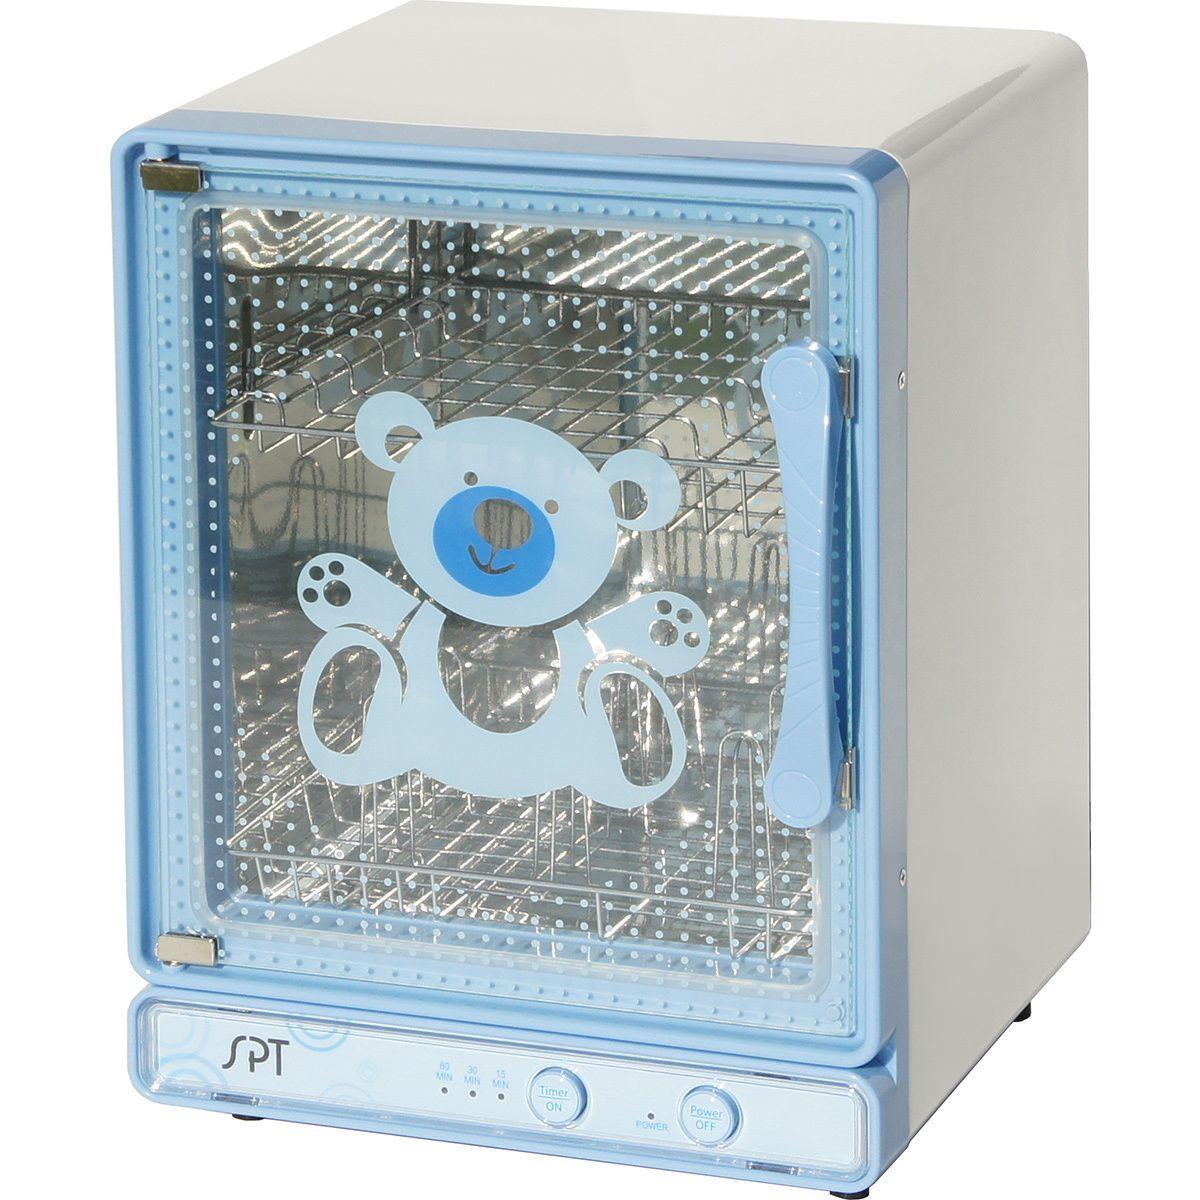 SPT Blue Baby Bottle Sterilizer and Dryer (Baby Bottle